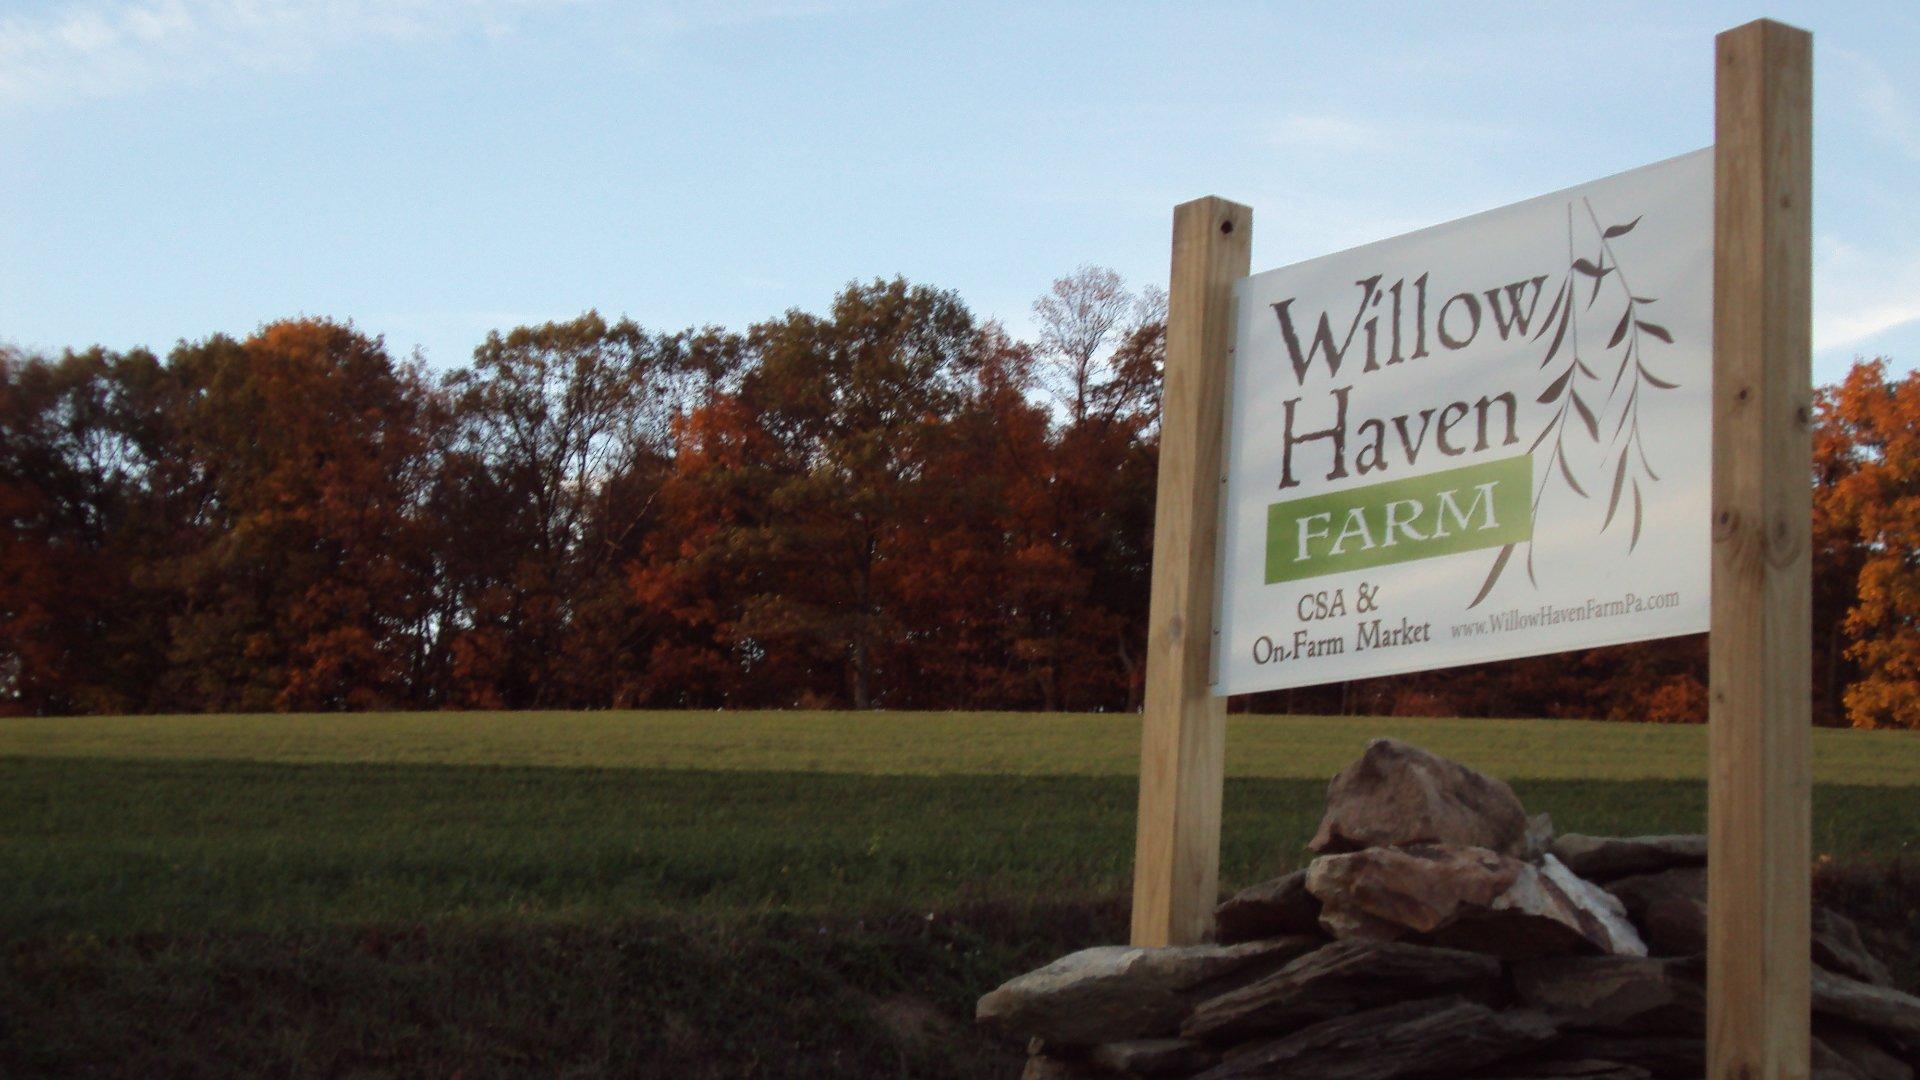 Upcoming Farm Tours, fresh veggies available all Fall, sweet potato soup recipe & more